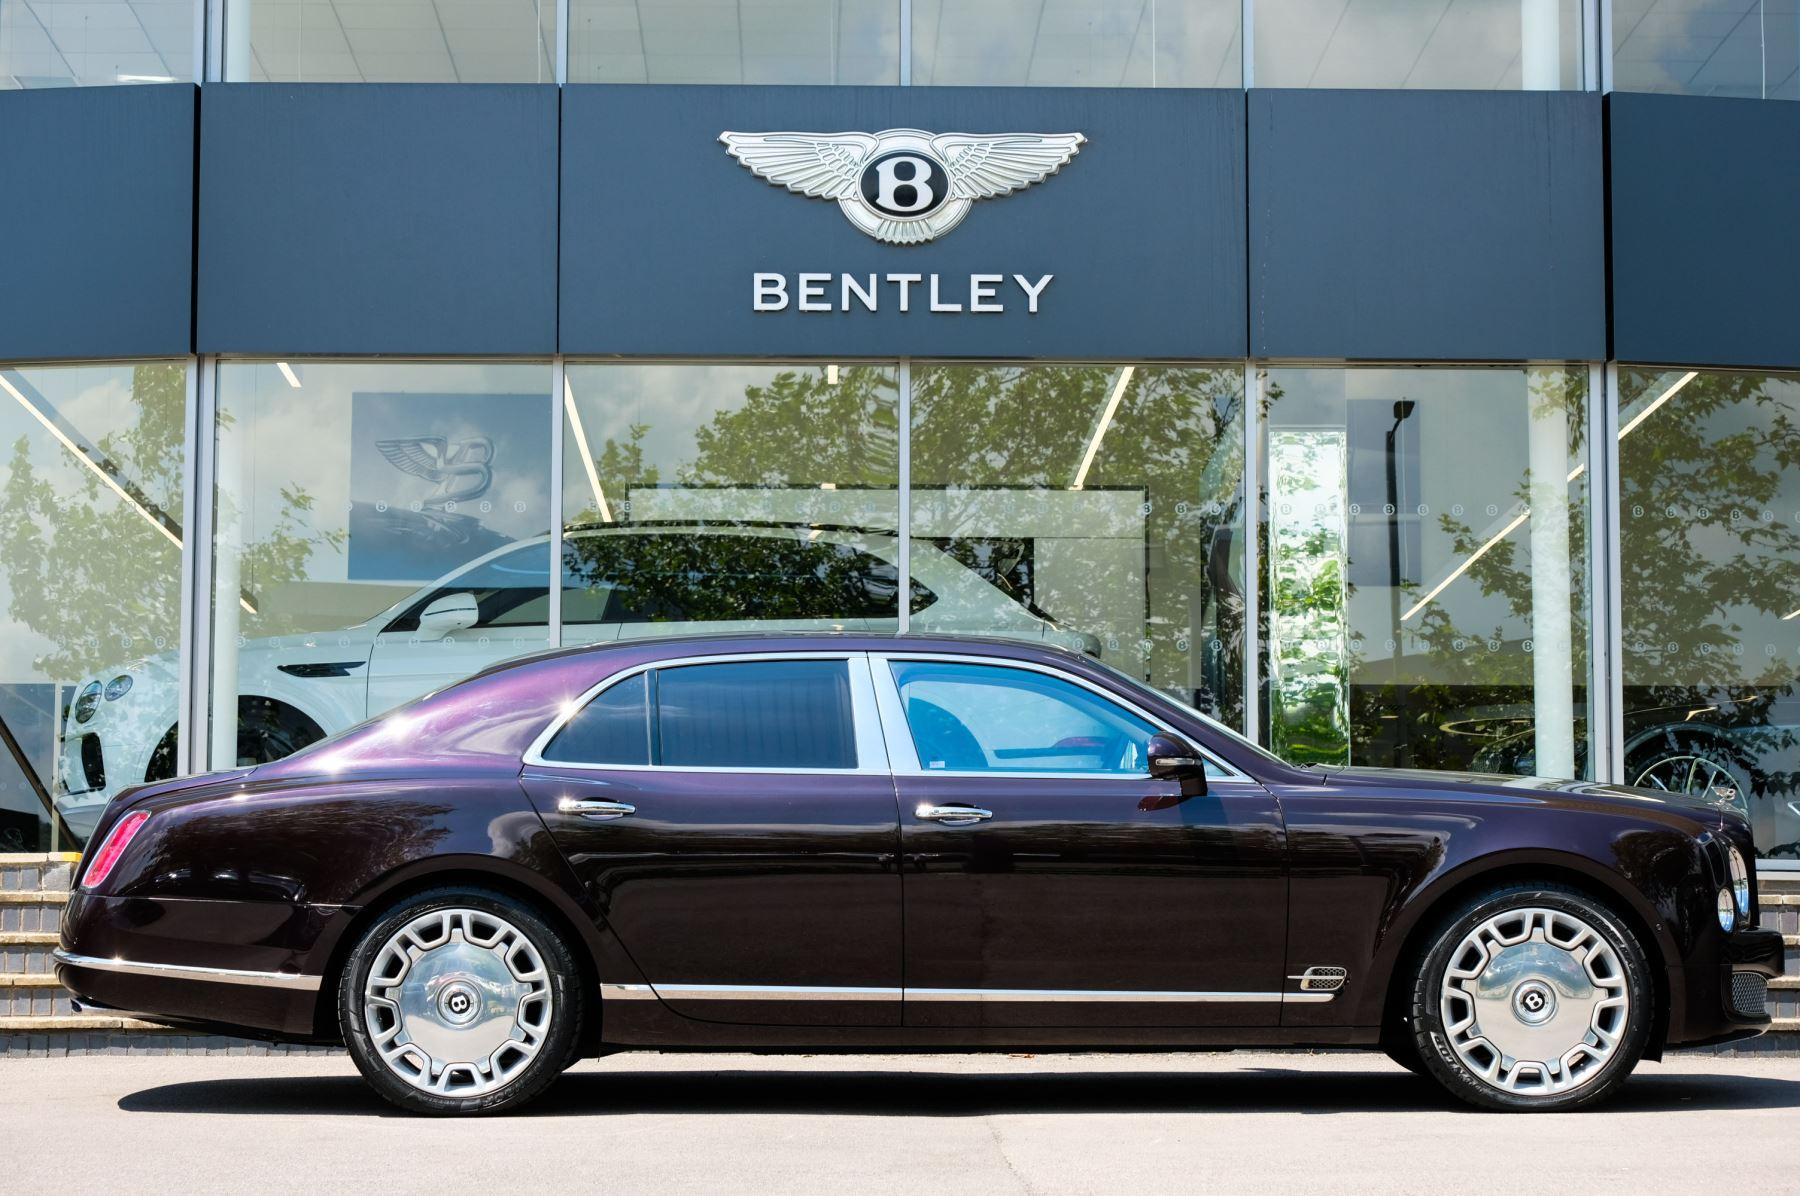 Bentley Mulsanne 6.8 V8 - Comfort, Entertainment and Premier Specification image 3